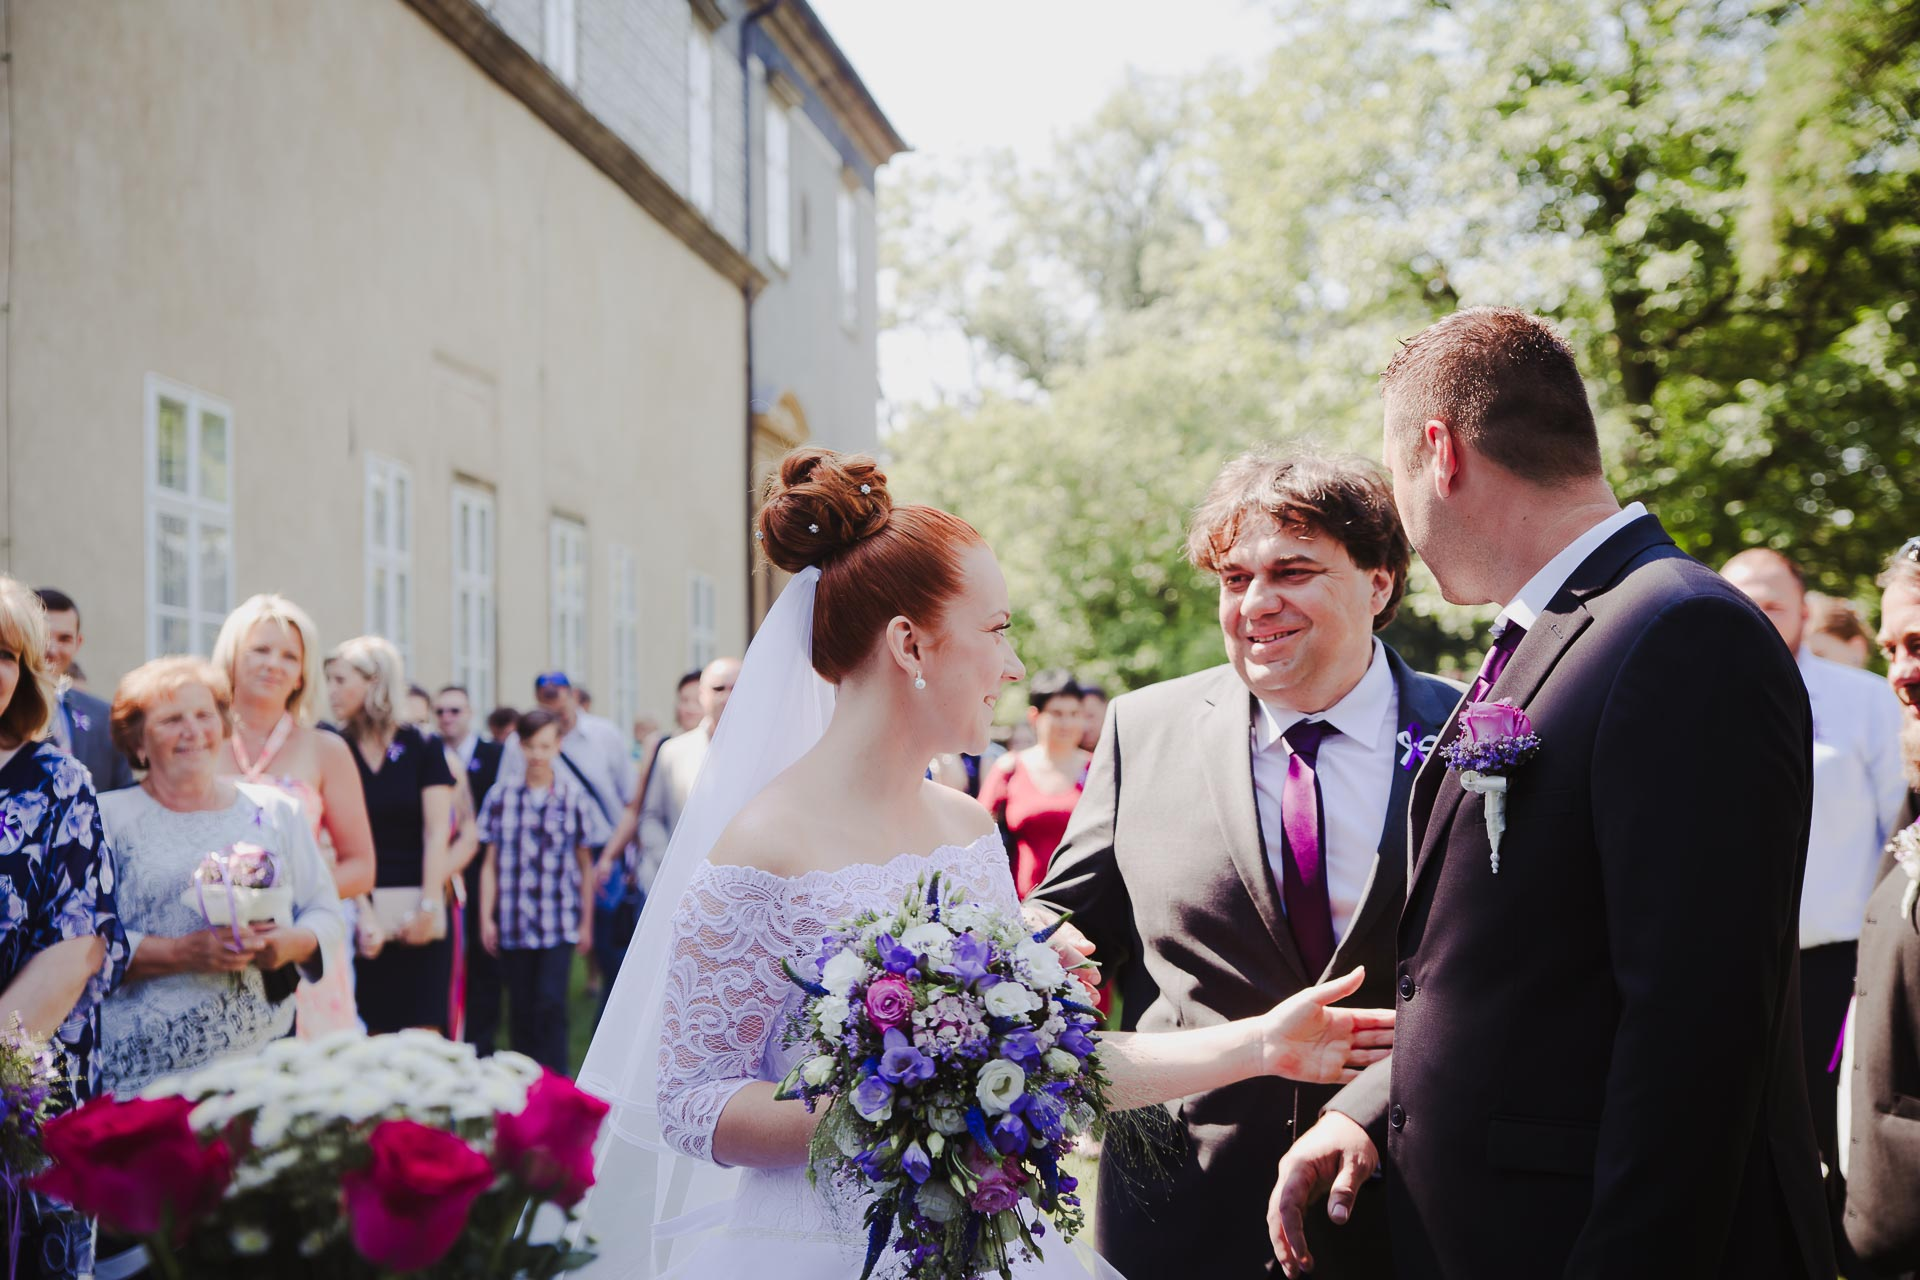 svatebni-fotografie-zamek-Brandys-nad-Labem-1162